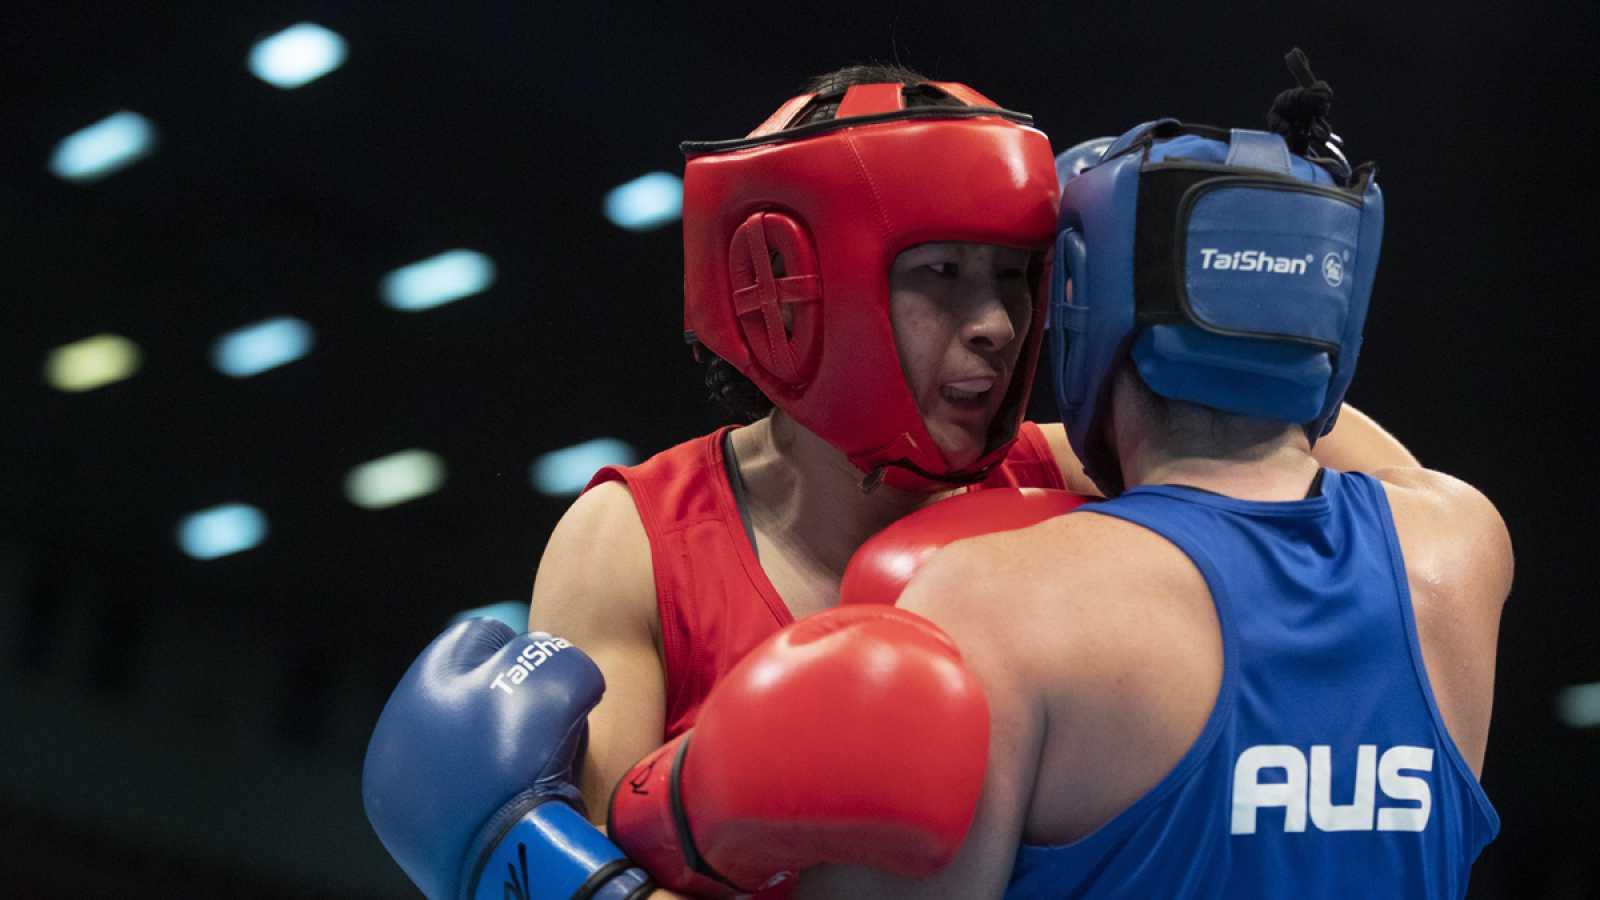 Imagen del combate entre Qian Li y Caitlin Parker